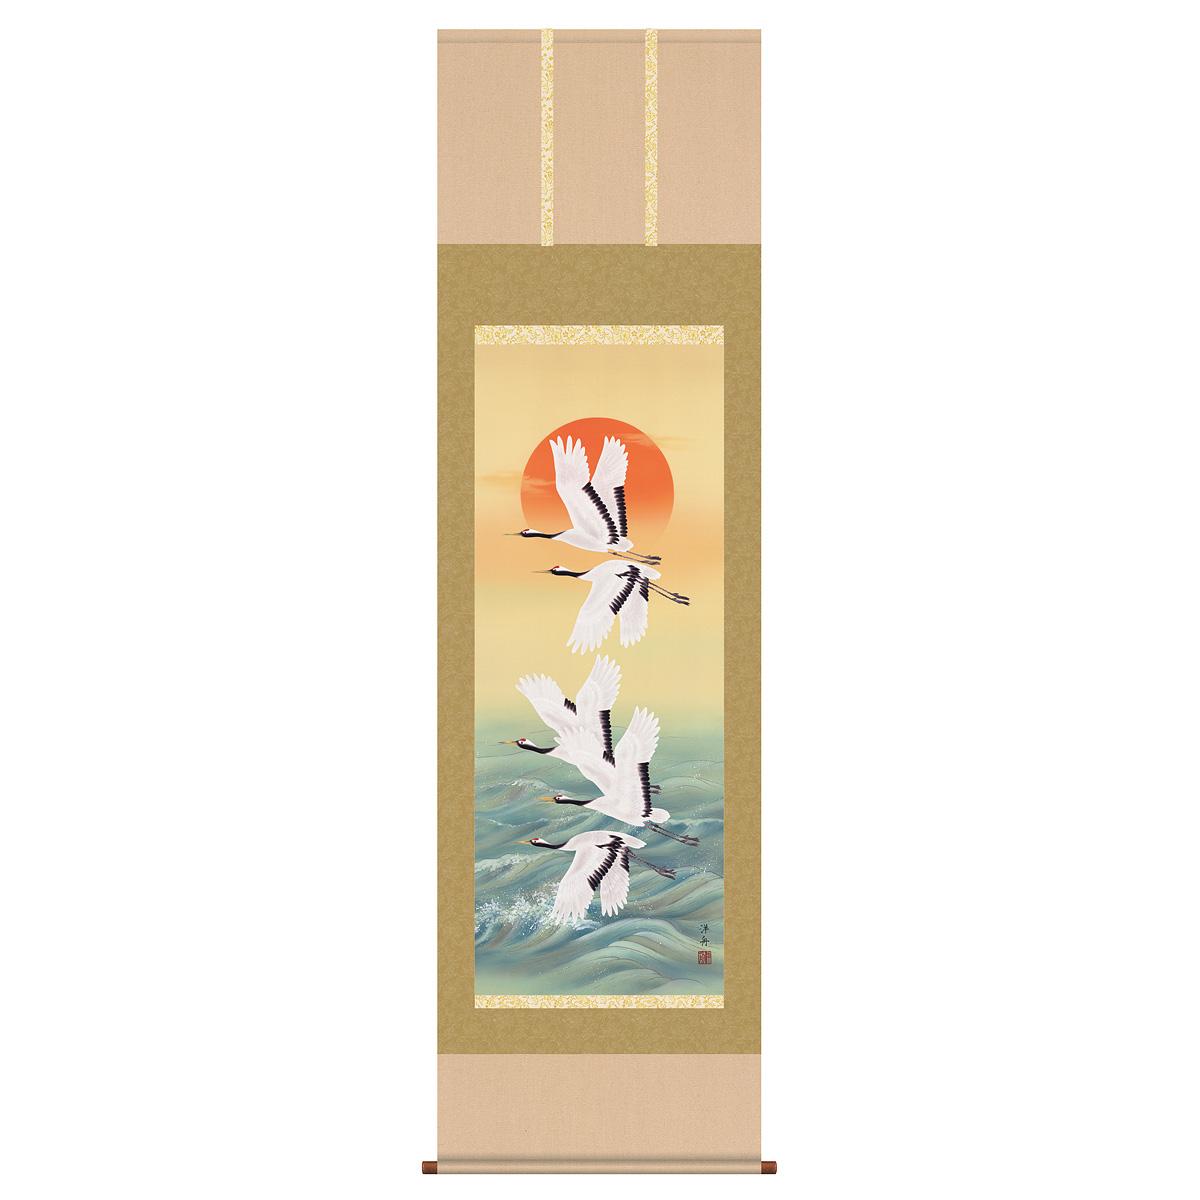 節句 正月 掛け軸 「小野洋舟(幸洋会)作 旭日飛翔 掛け軸」2016年雛人形 ●正月飾り